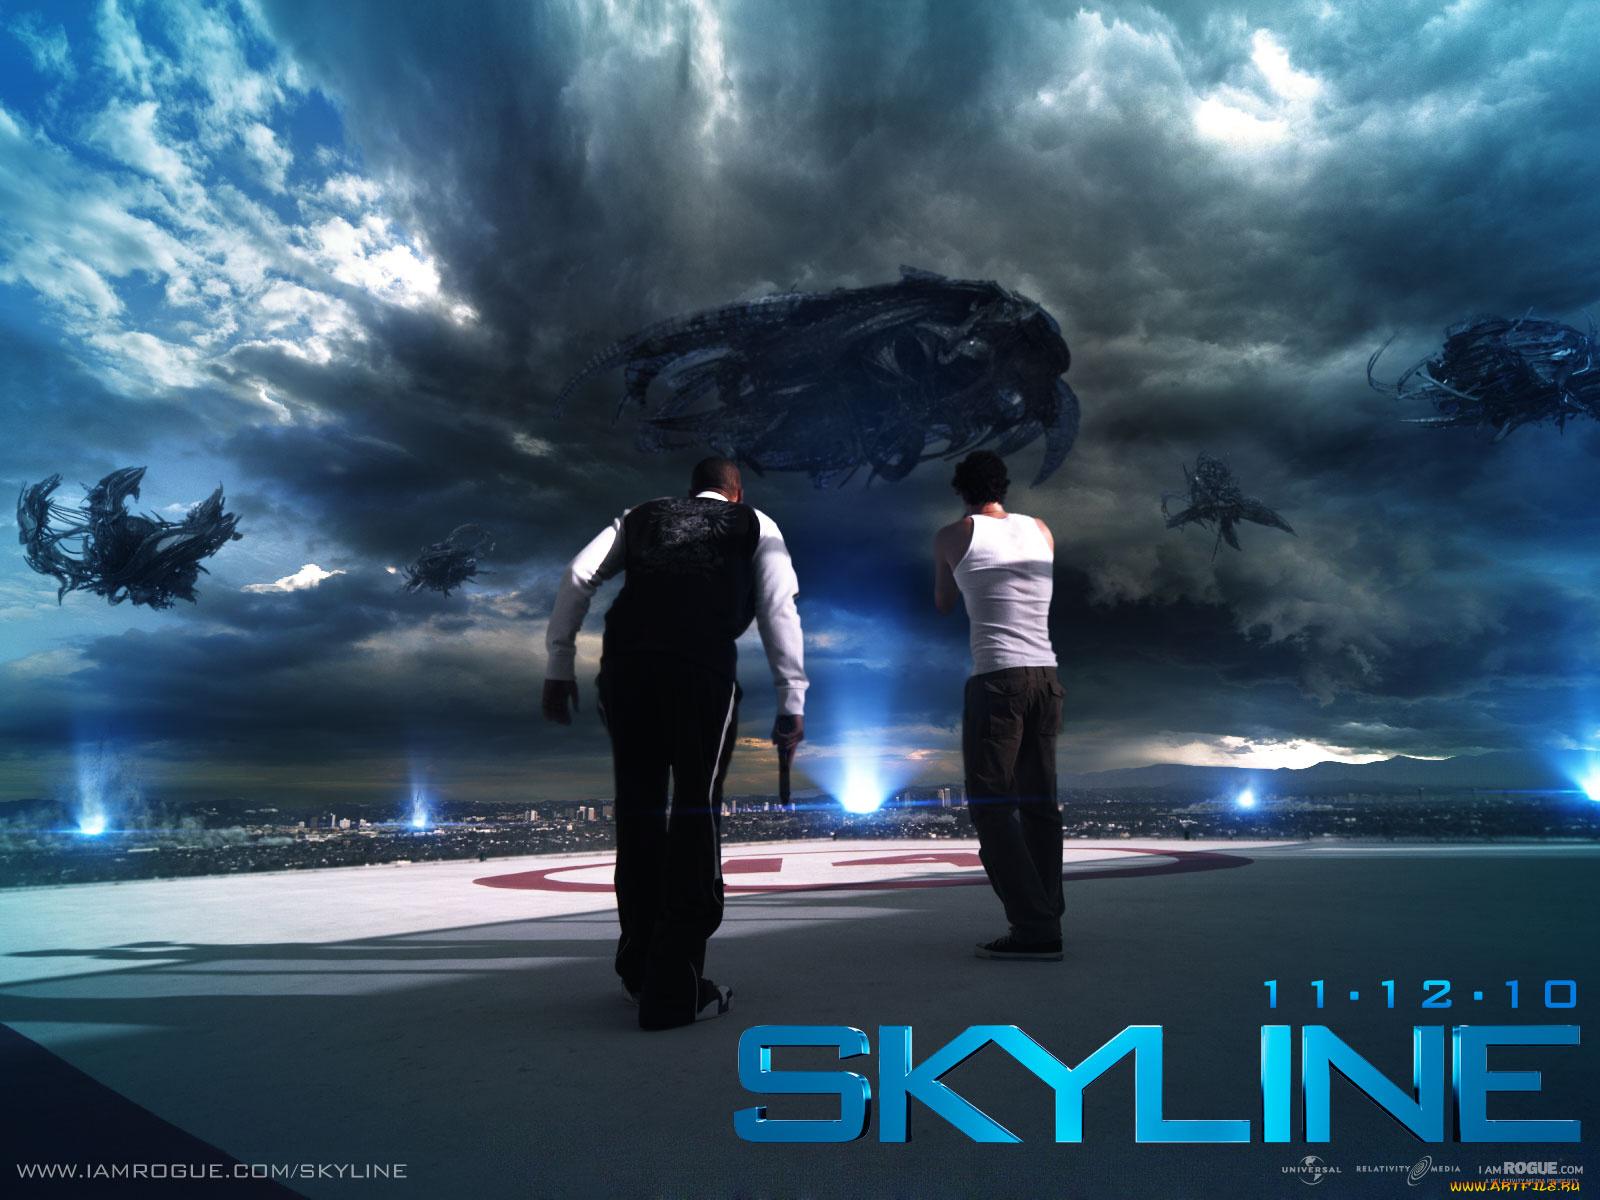 skyline dual audio 300mb worldfree4u